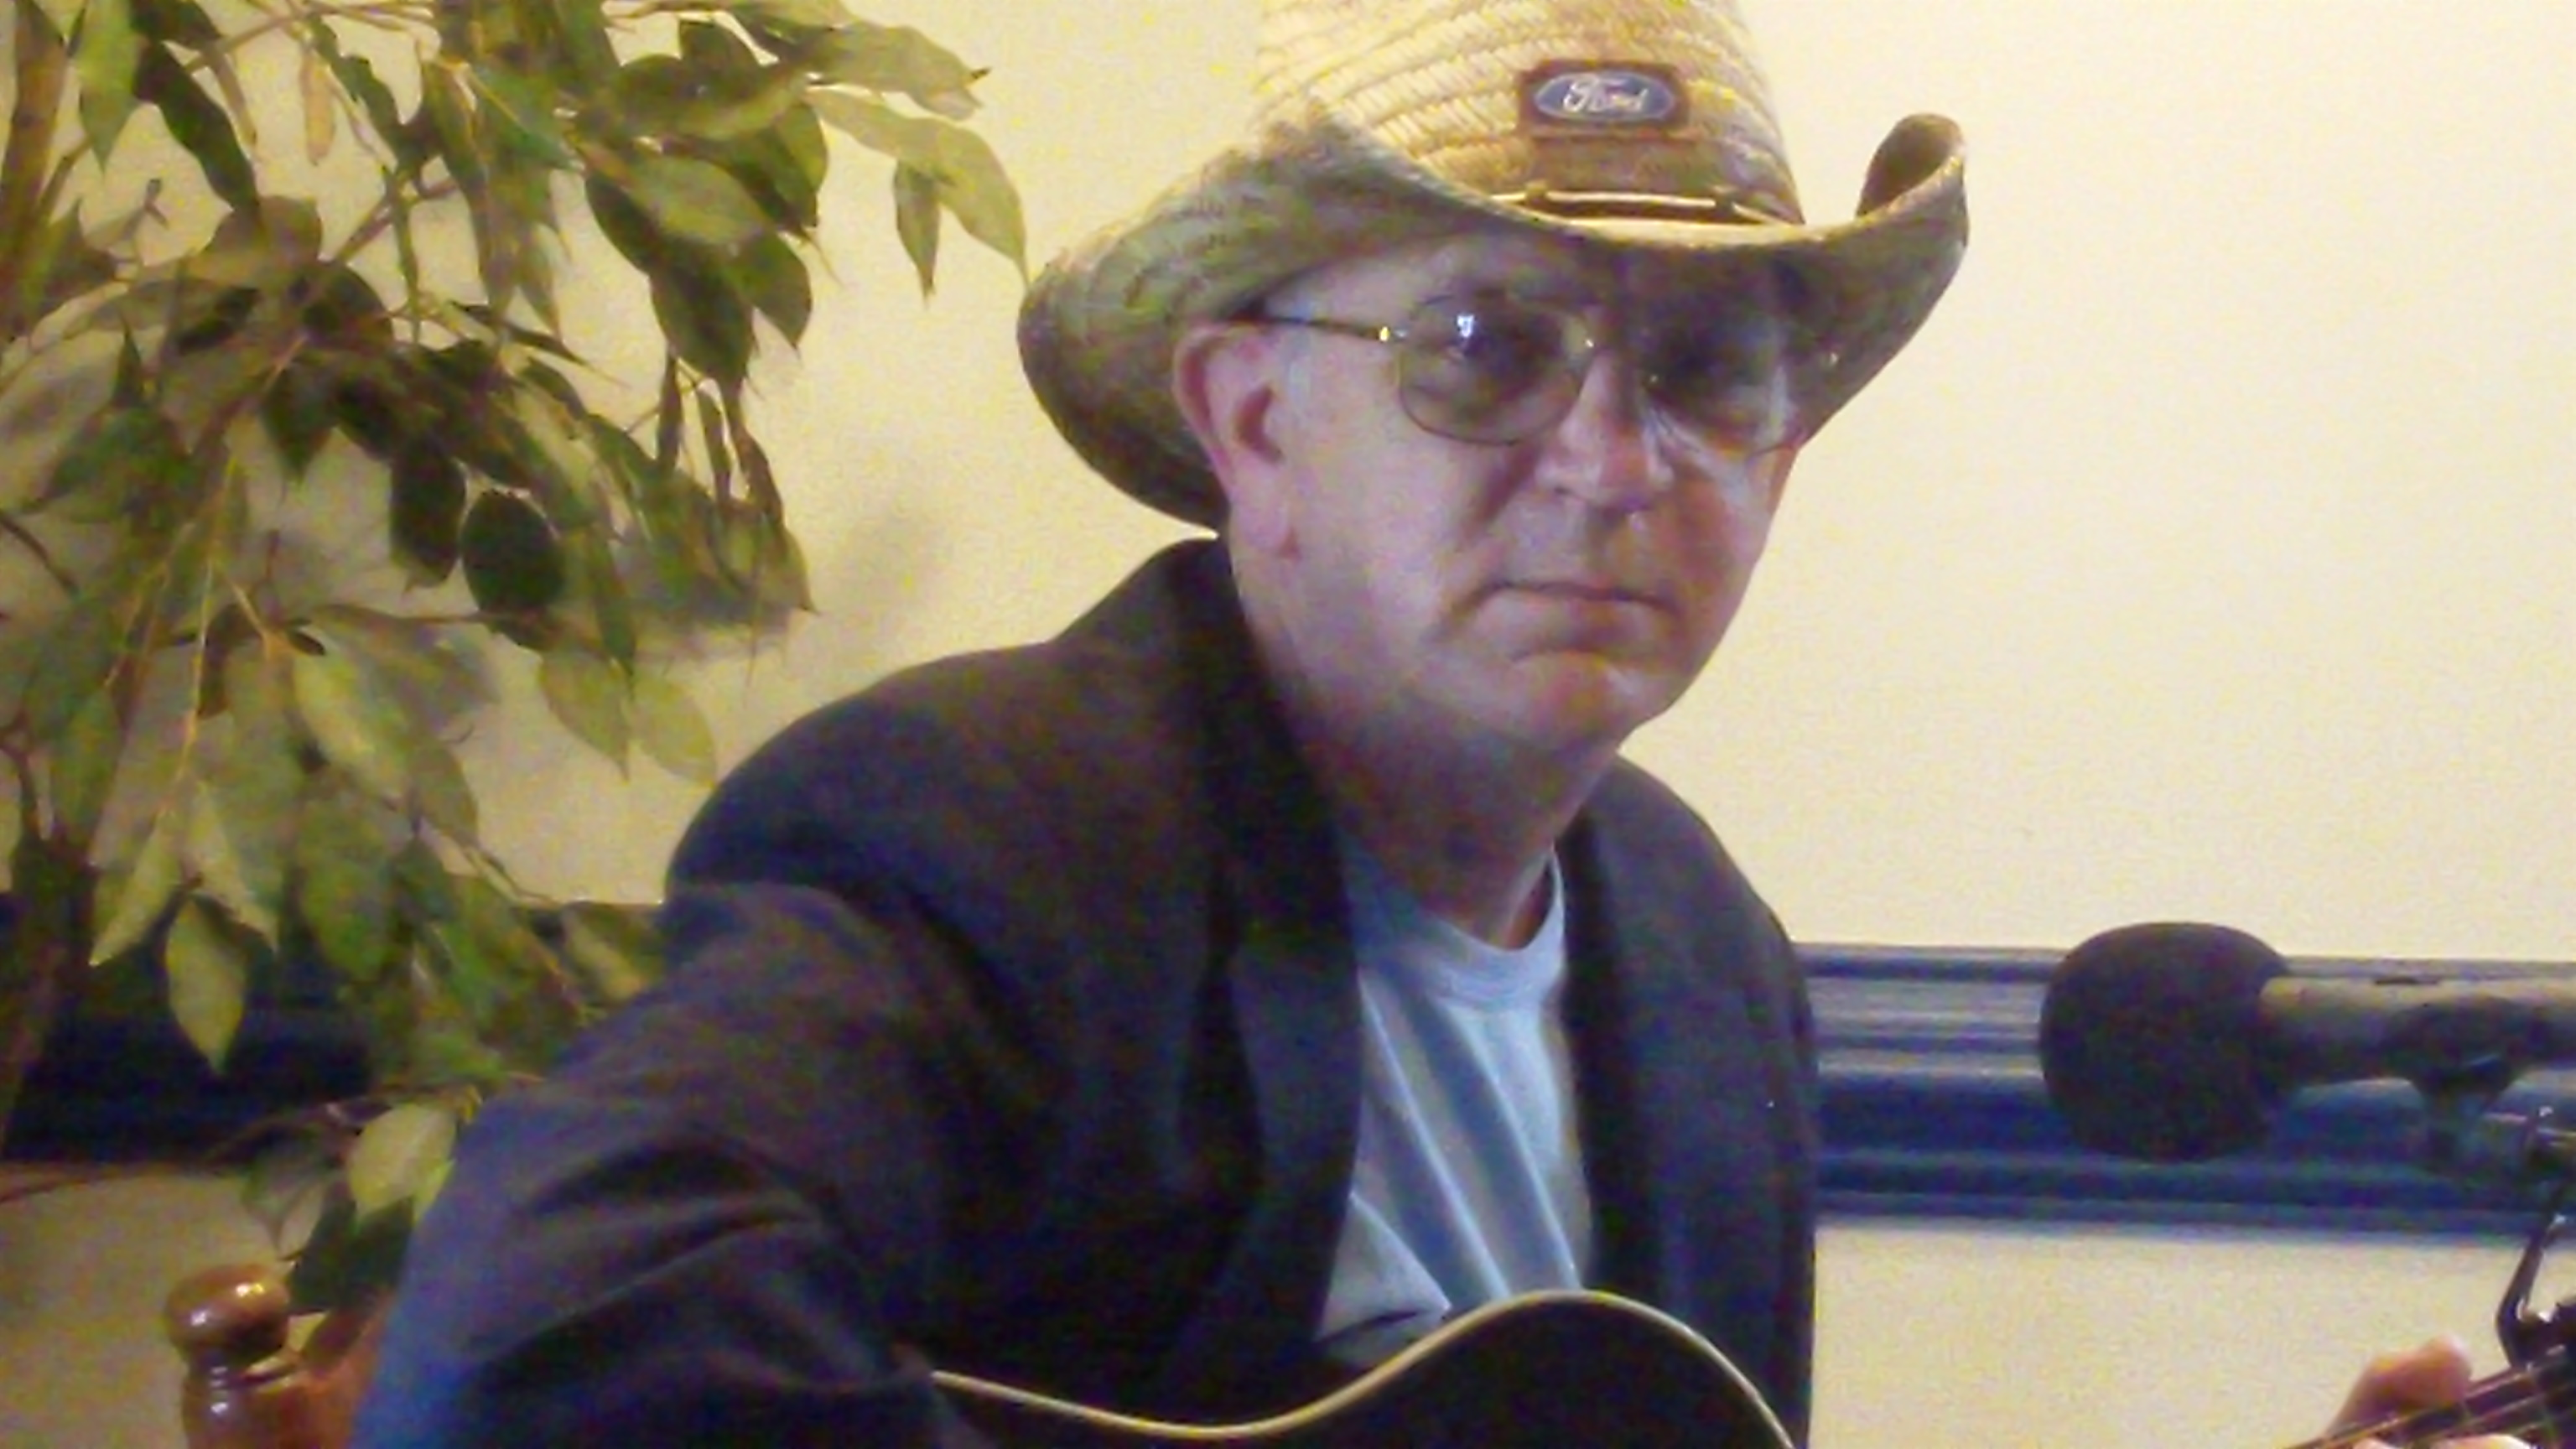 Glen Colbert